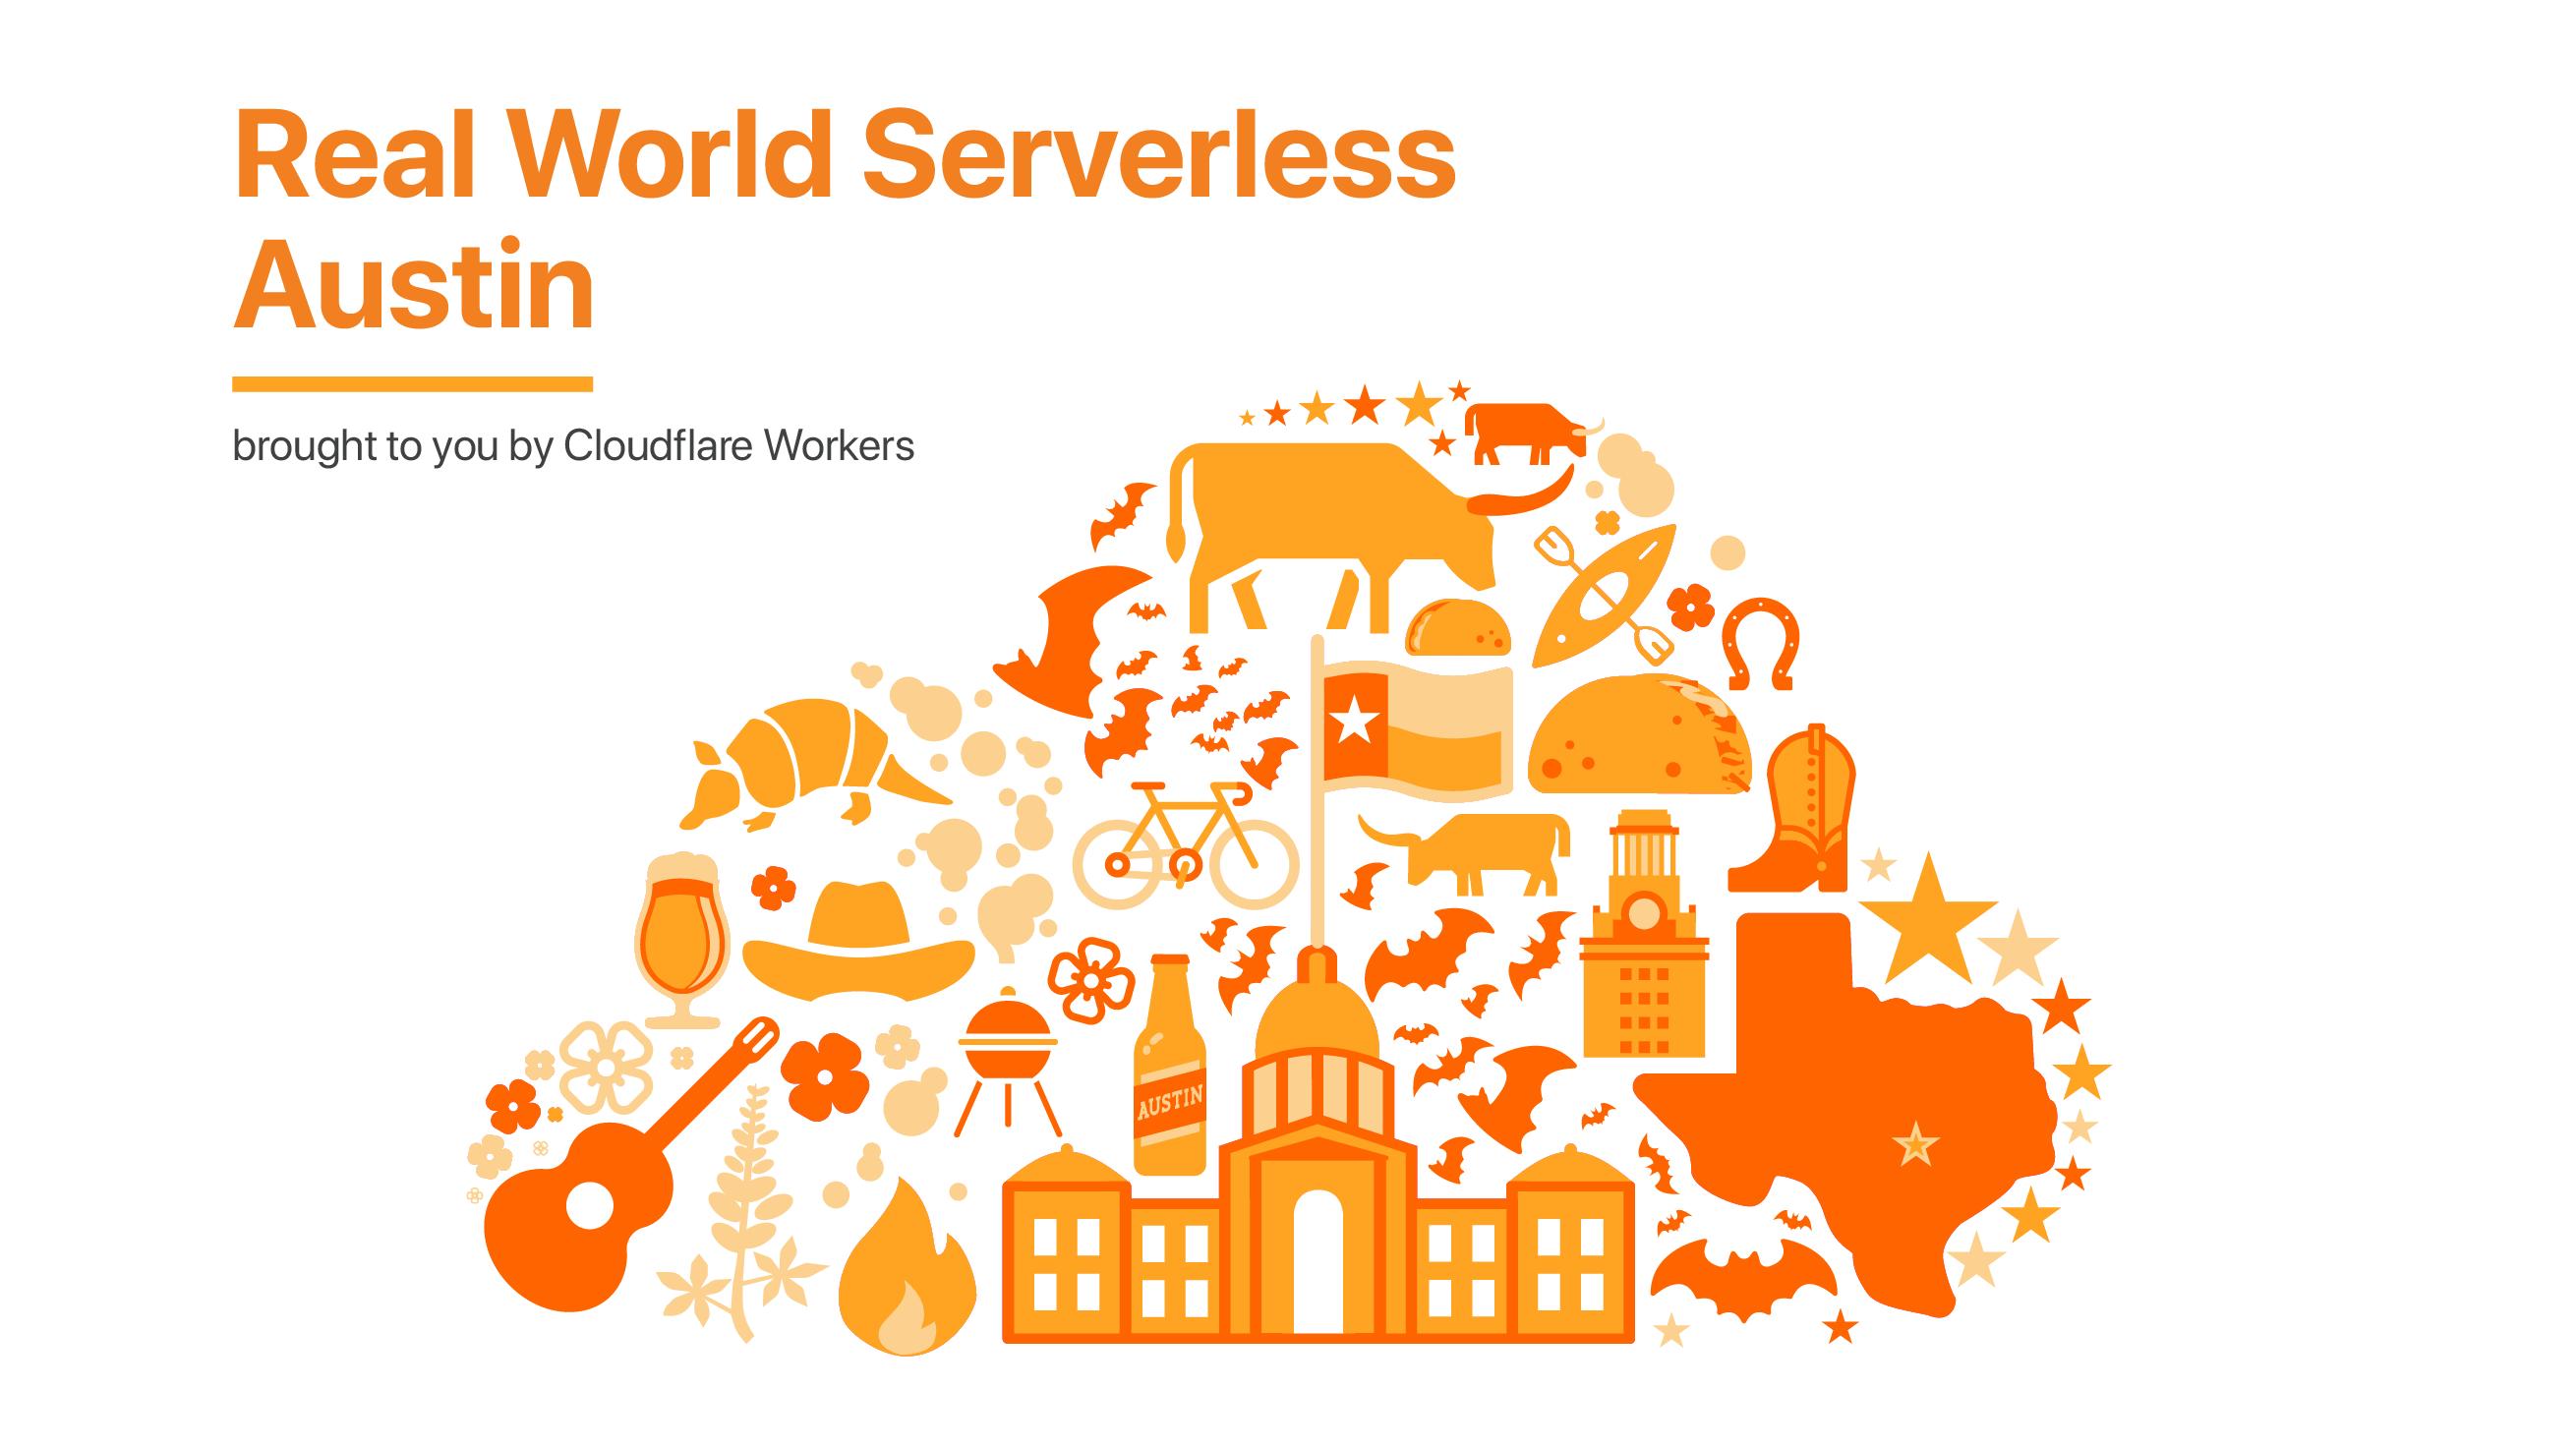 Real World Serverless - Austin